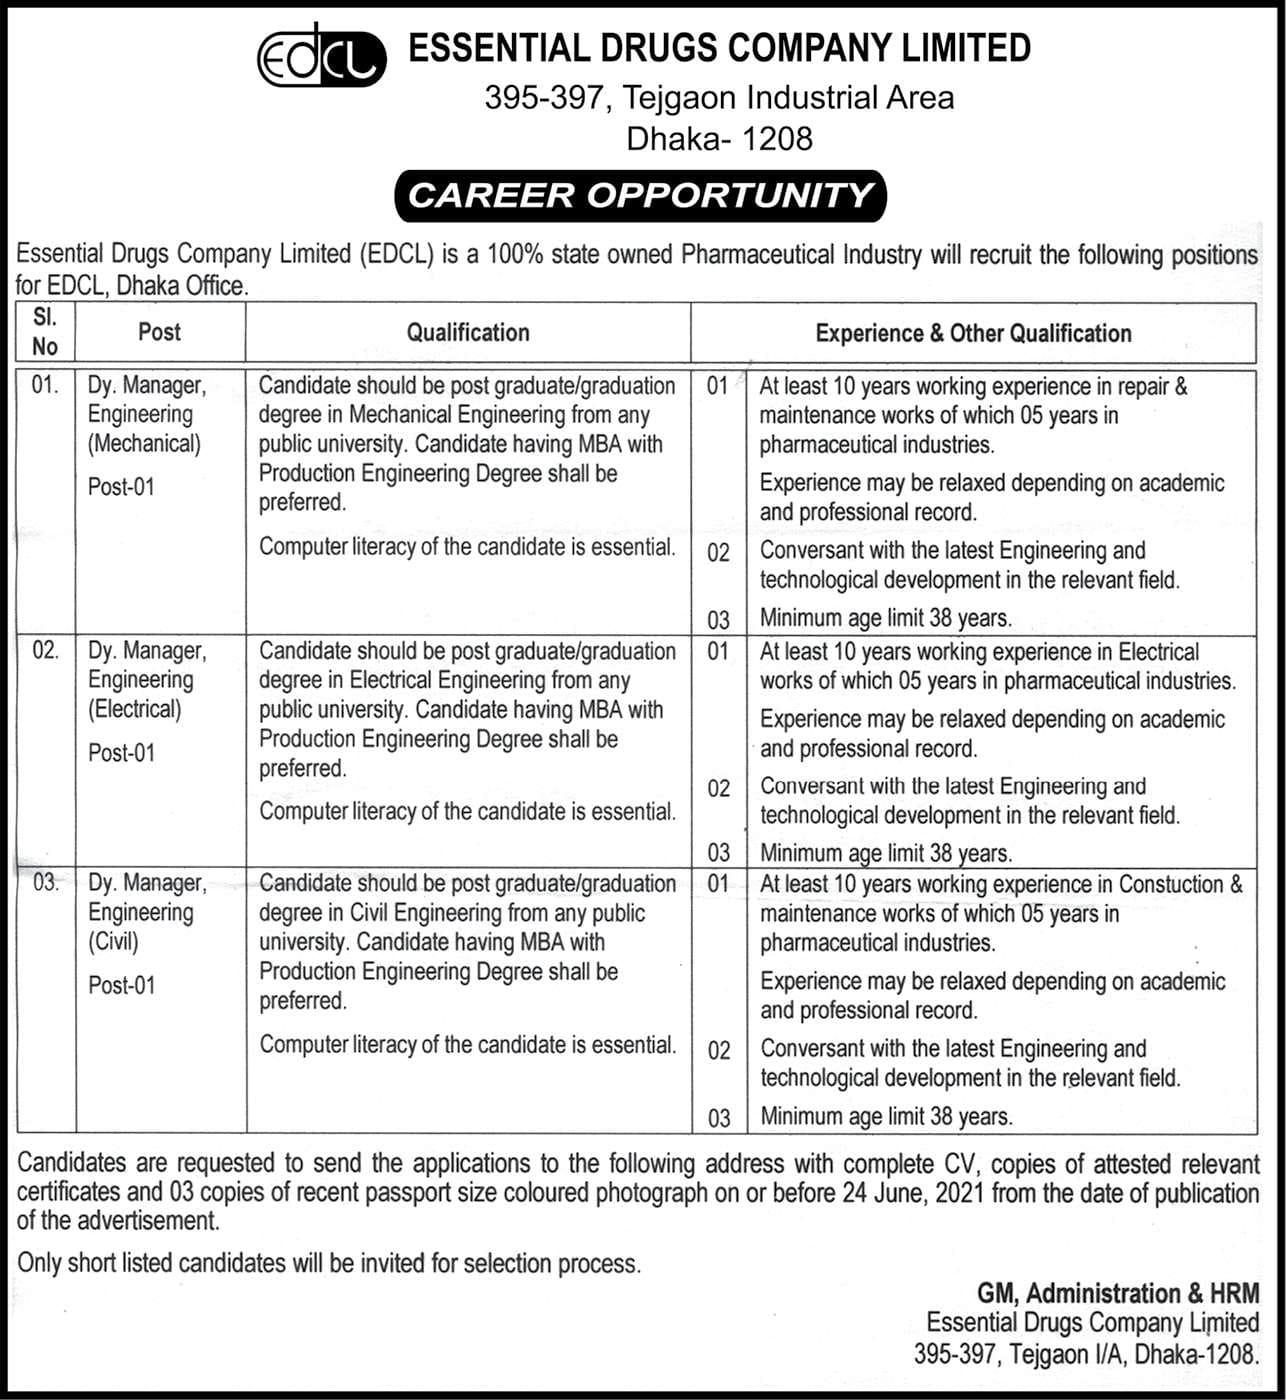 Essential Drugs Company Limited Job Circular 2021